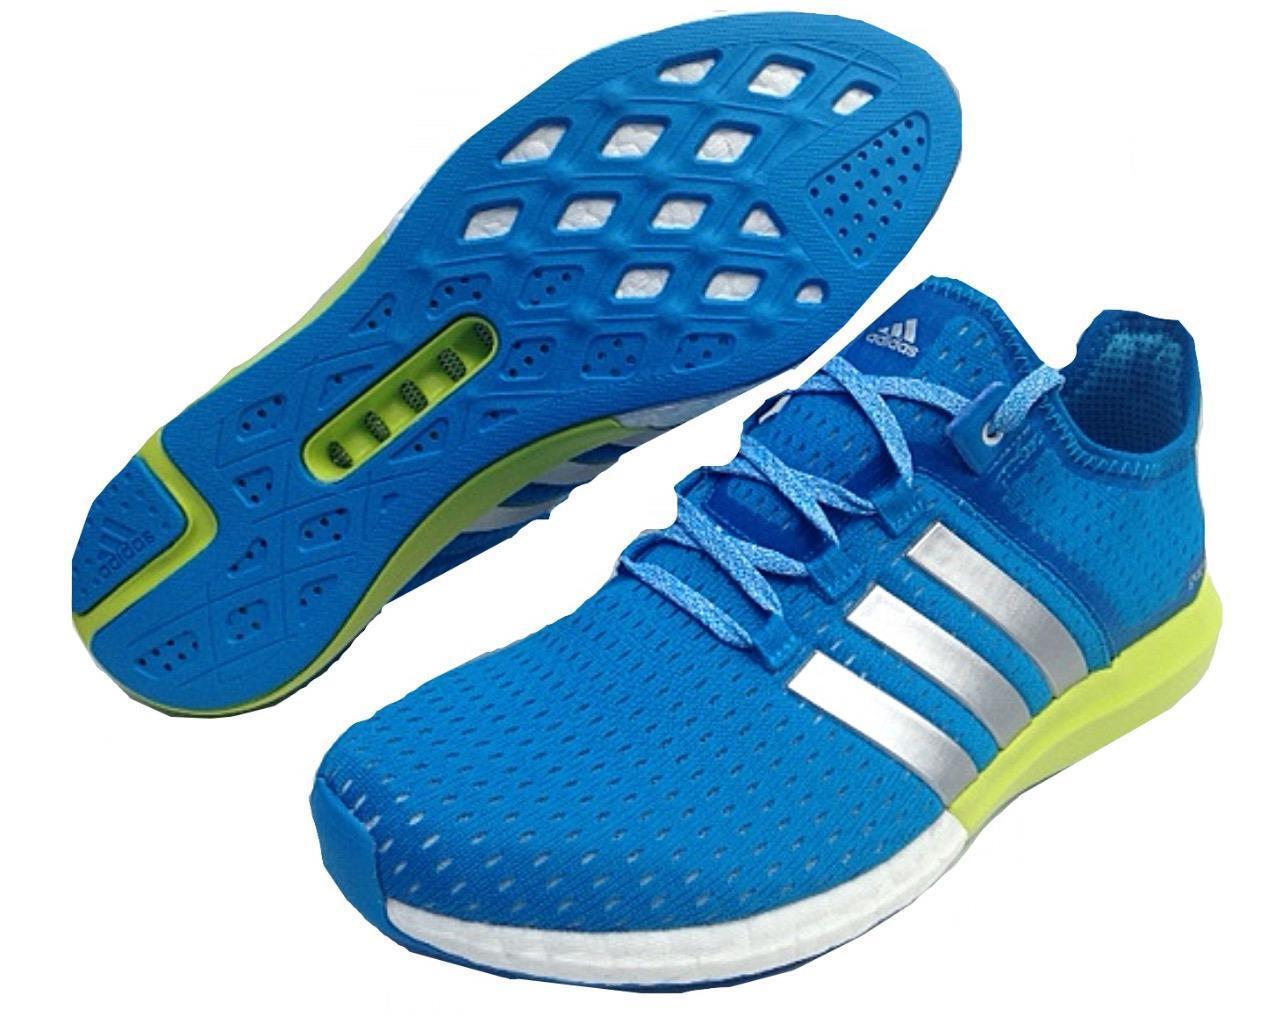 Adidas Herren ClimaCool Gazellen Verstärkung Original Trainer s77241 blau UK